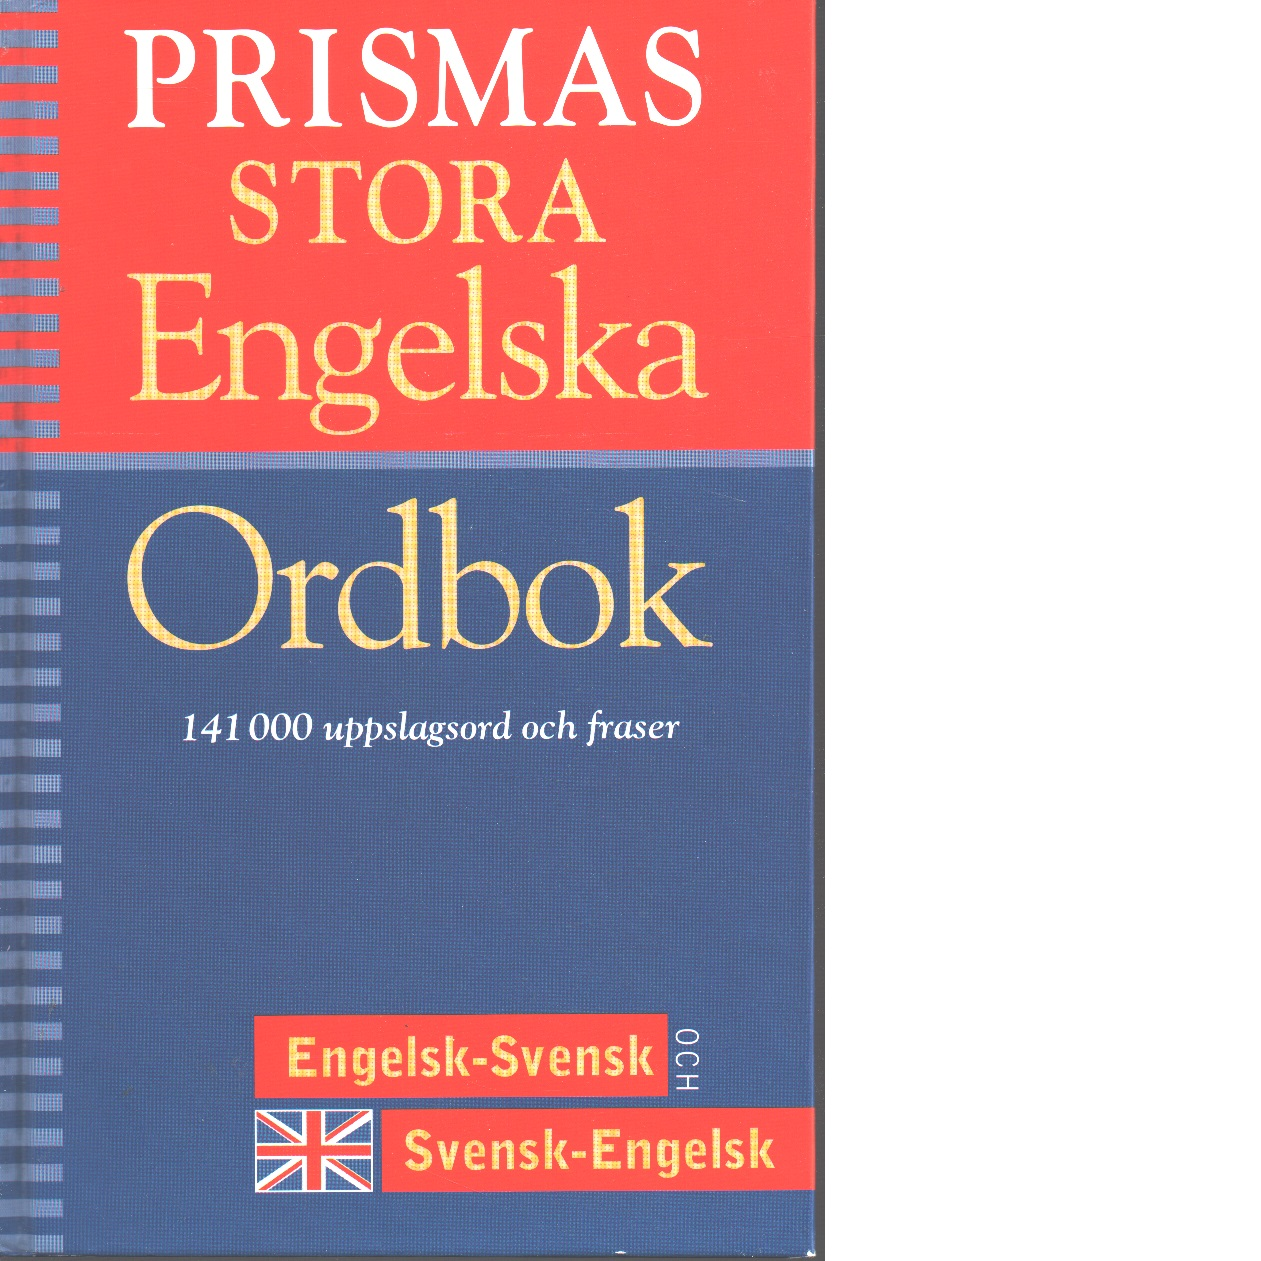 Prismas stora engelska ordbok : engelsk-svensk, svensk-engelsk : [141000 uppslagsord och fraser] - Red.